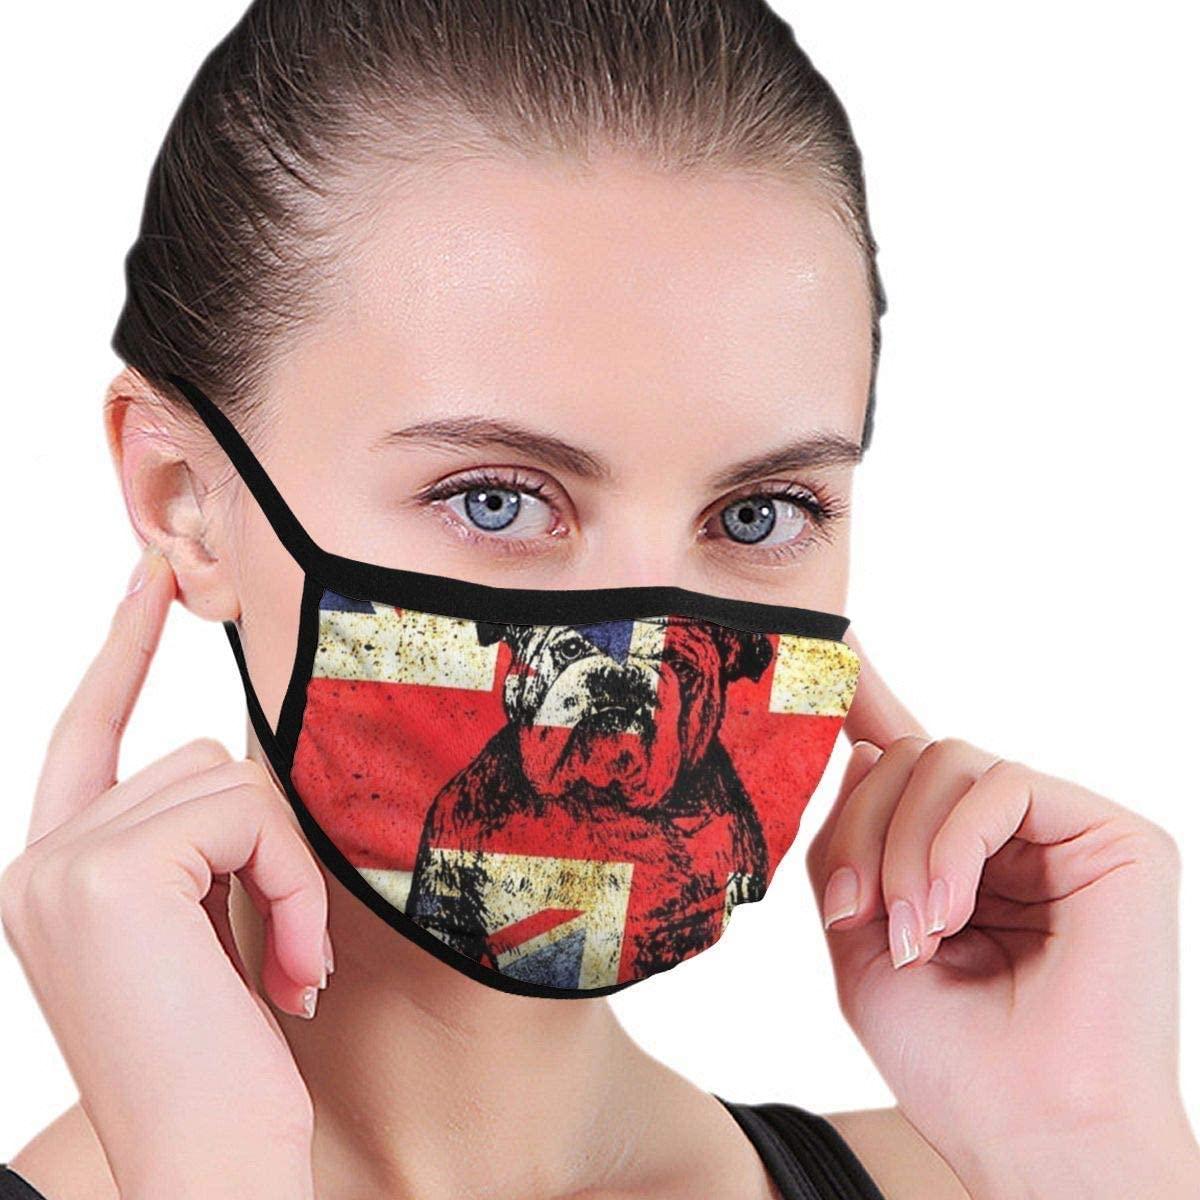 BOKUTT Adjustable Decorative Masks,Unisex Adult Anti-Dust BritishUK Flag Union Jack Cover Washable for Men Women-Washable and reusable